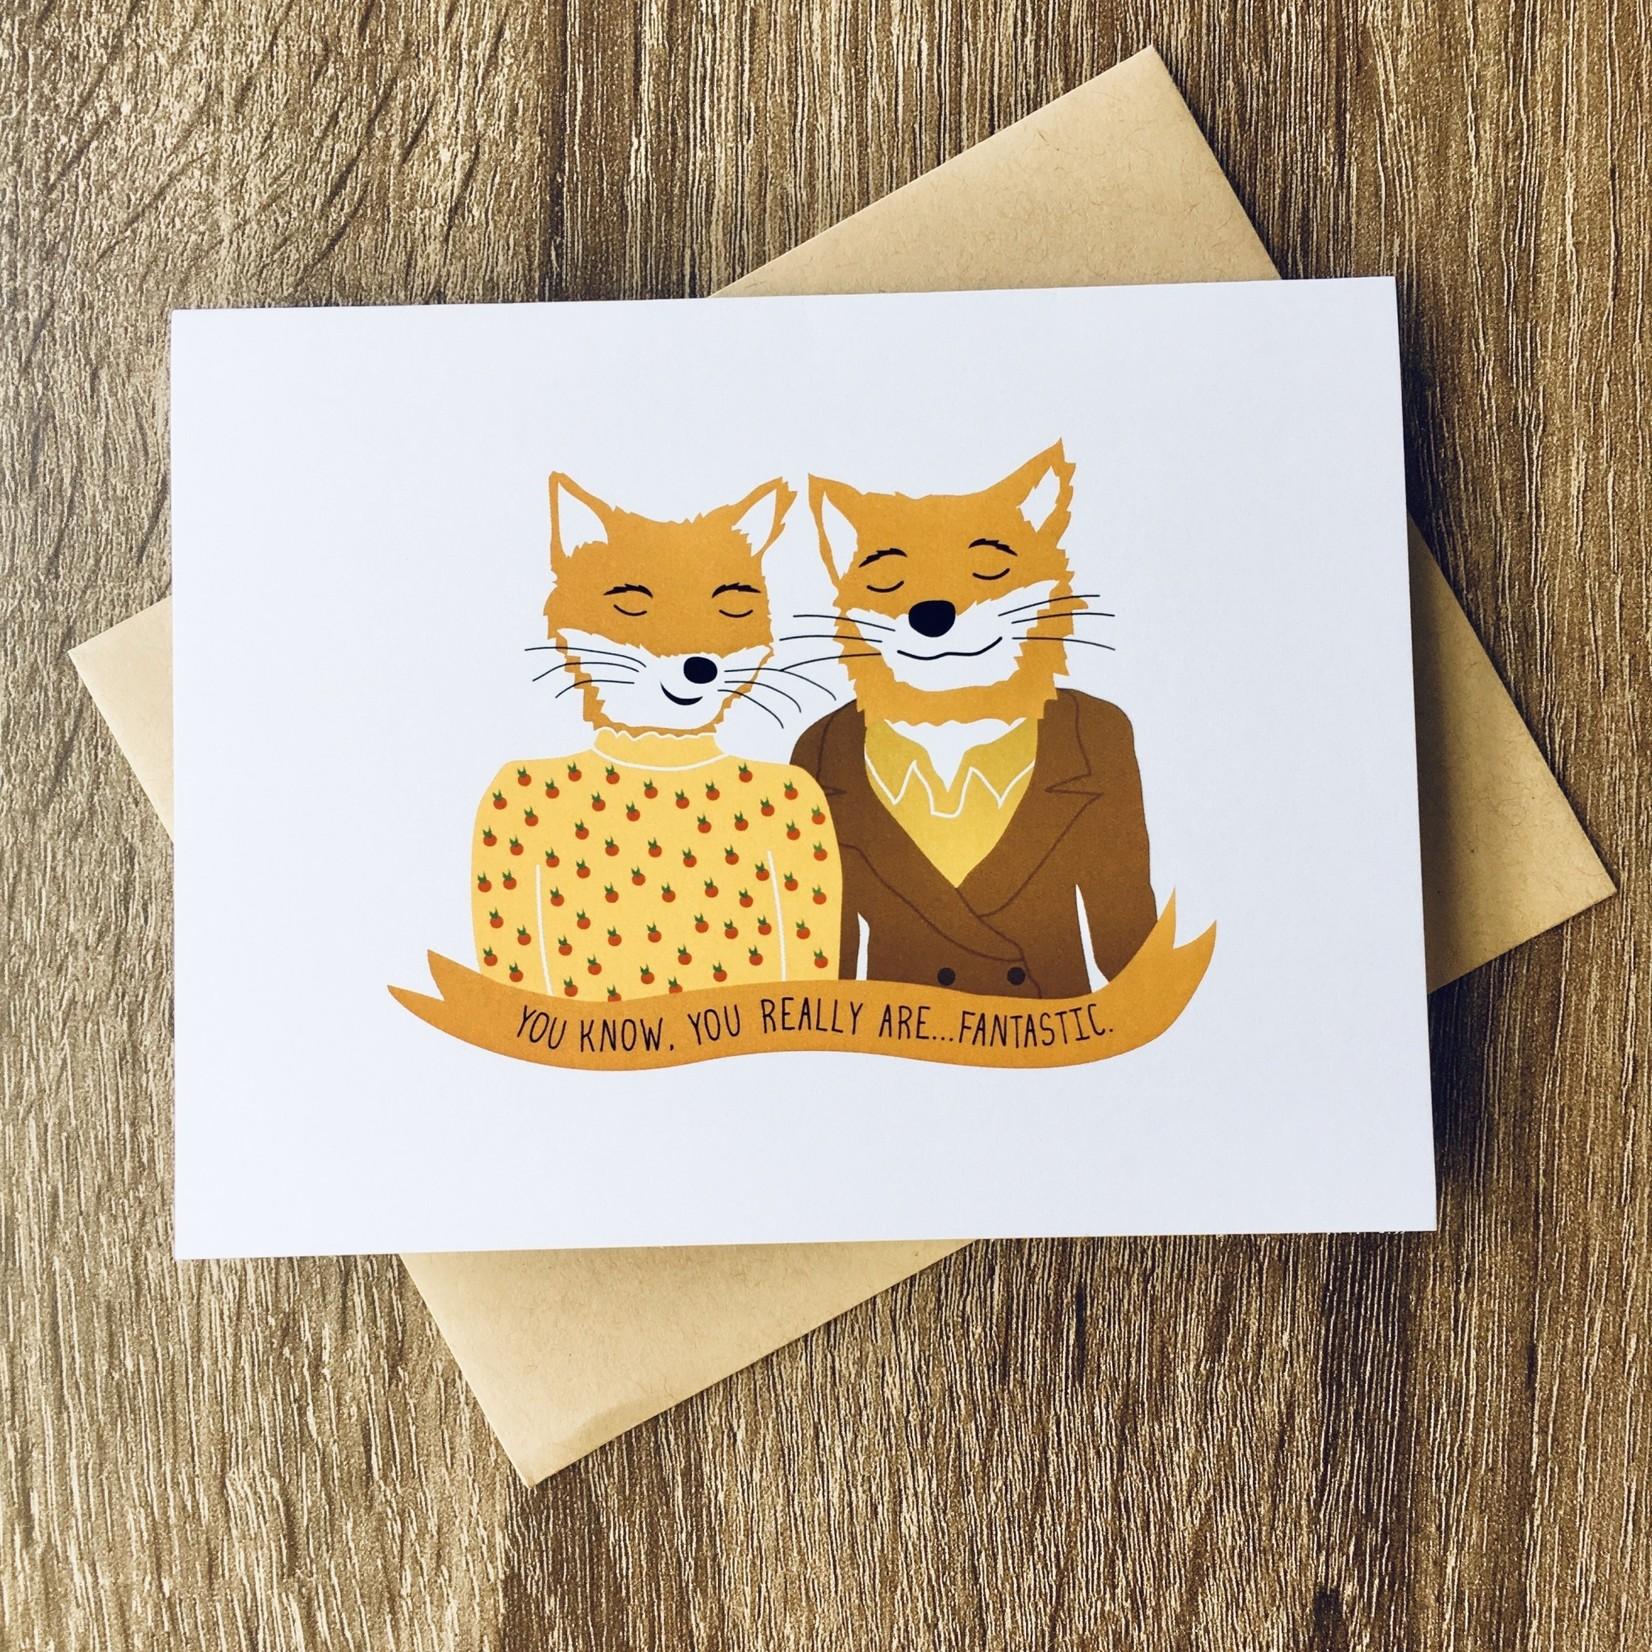 Arthur's Plaid Pants Fantastic Mr. Fox Greeting Card